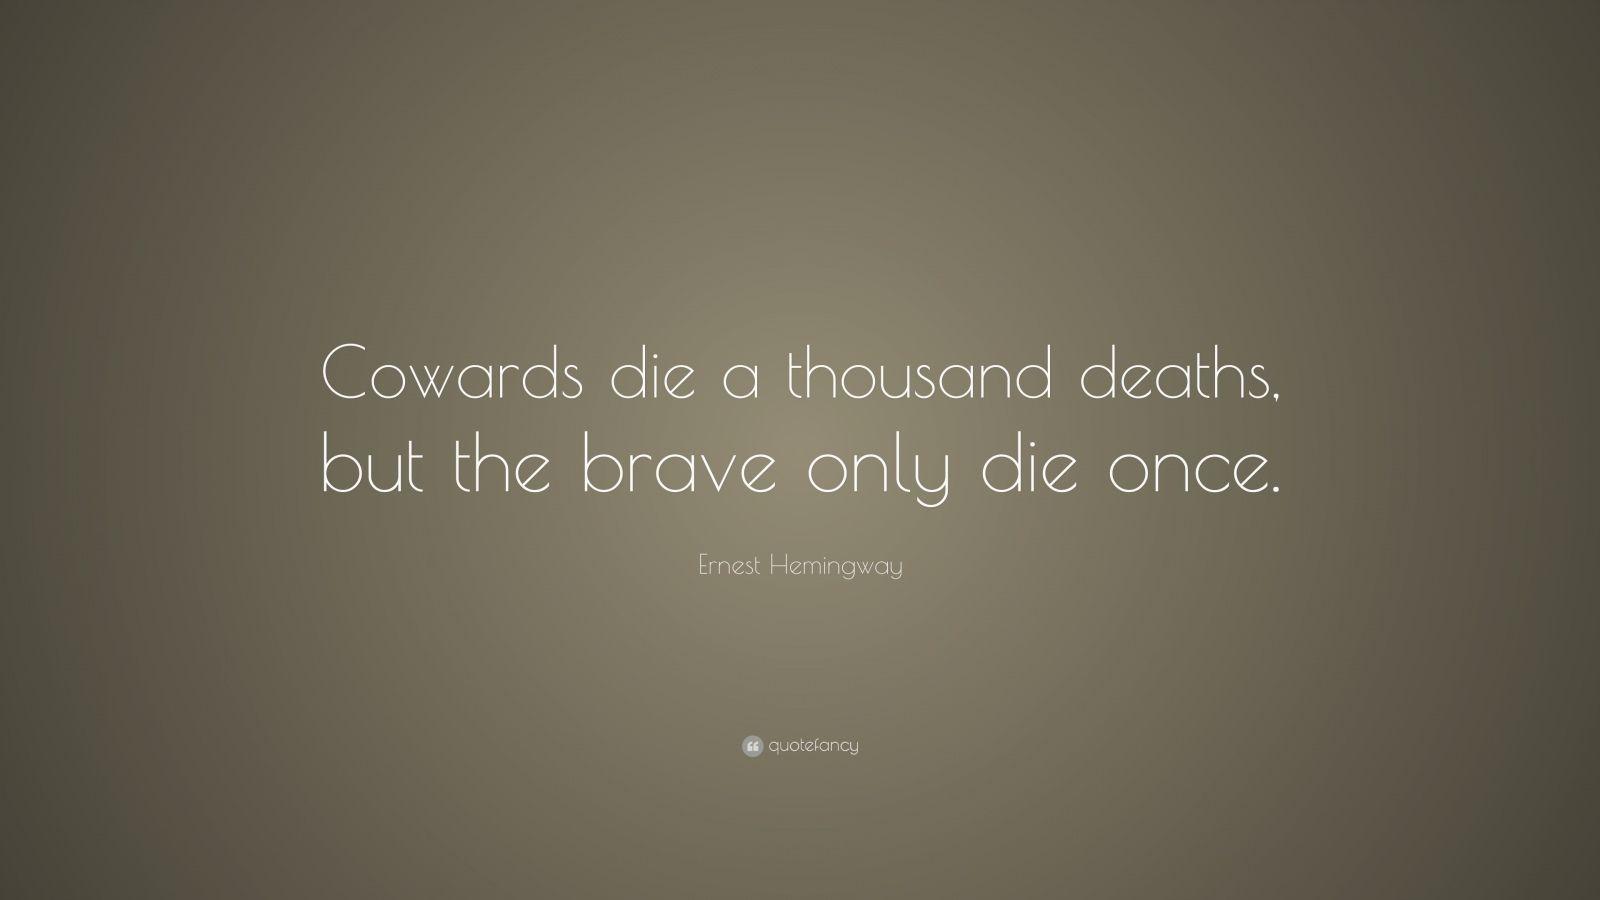 cowards die a thousand deaths essay help